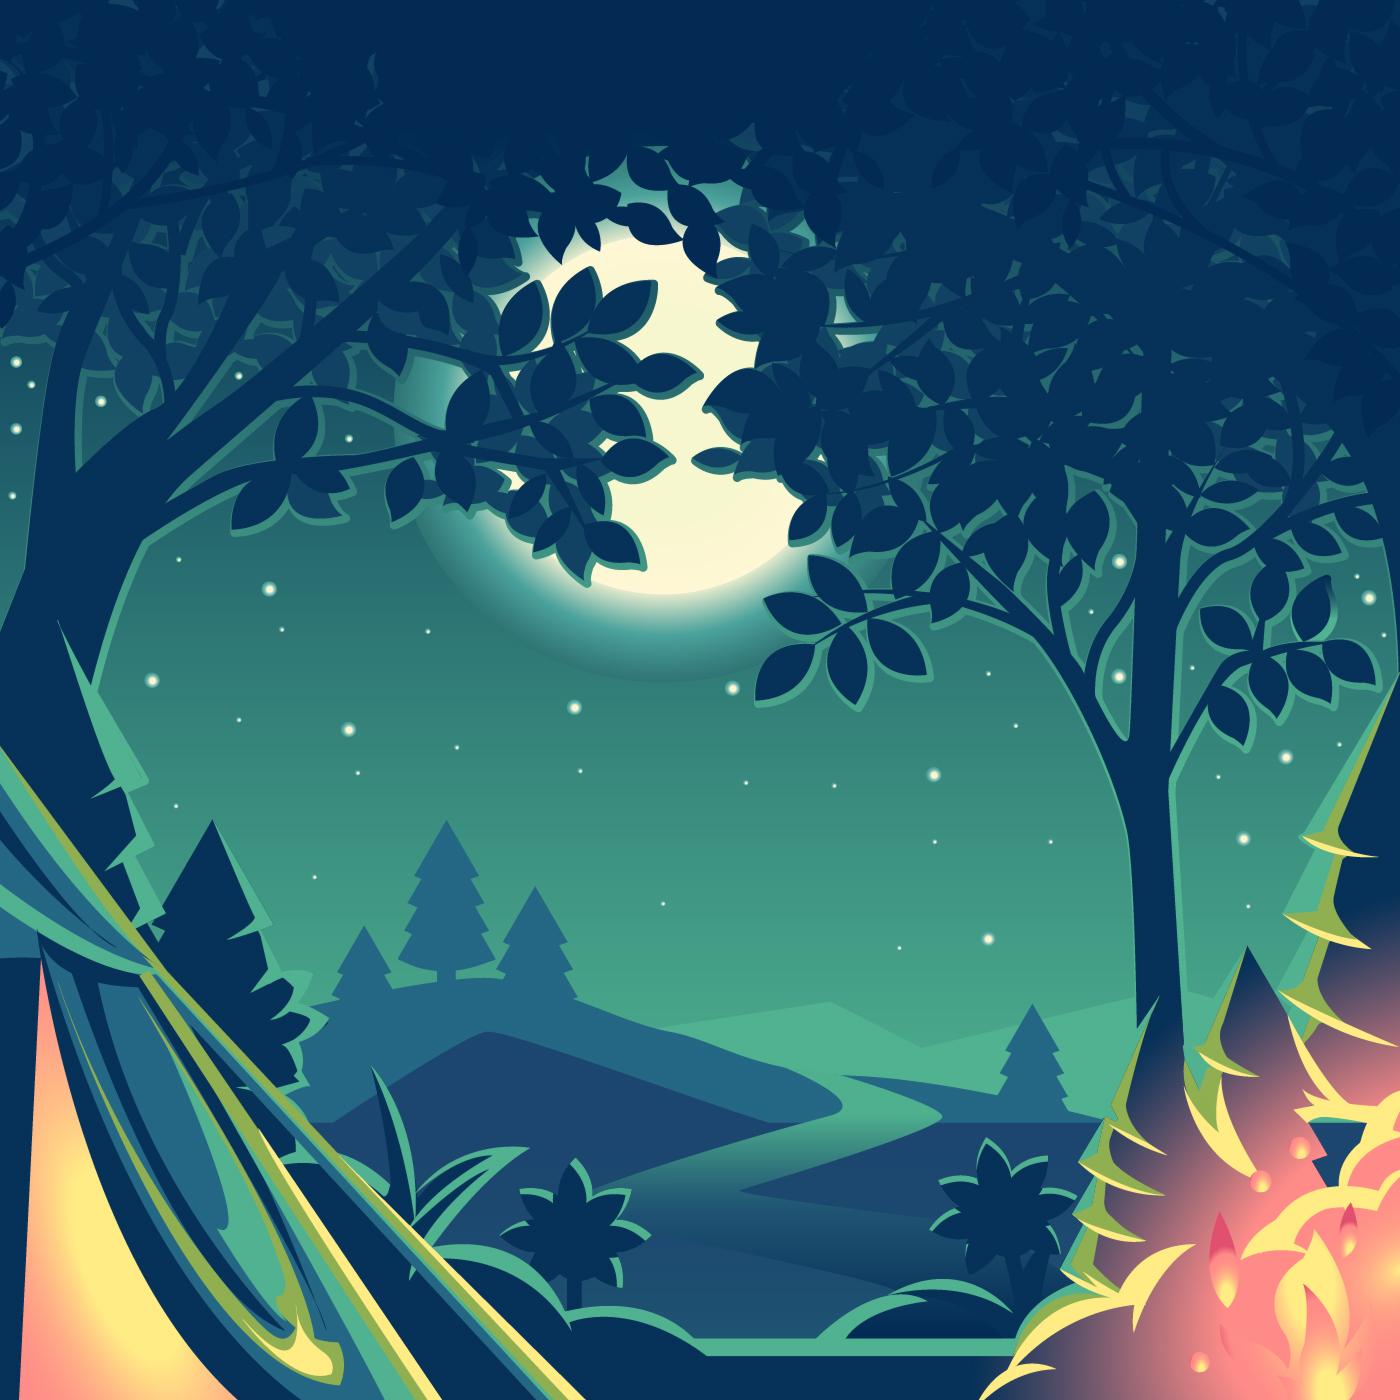 Night Icon Free Vector Art - (72992 Free Downloads)